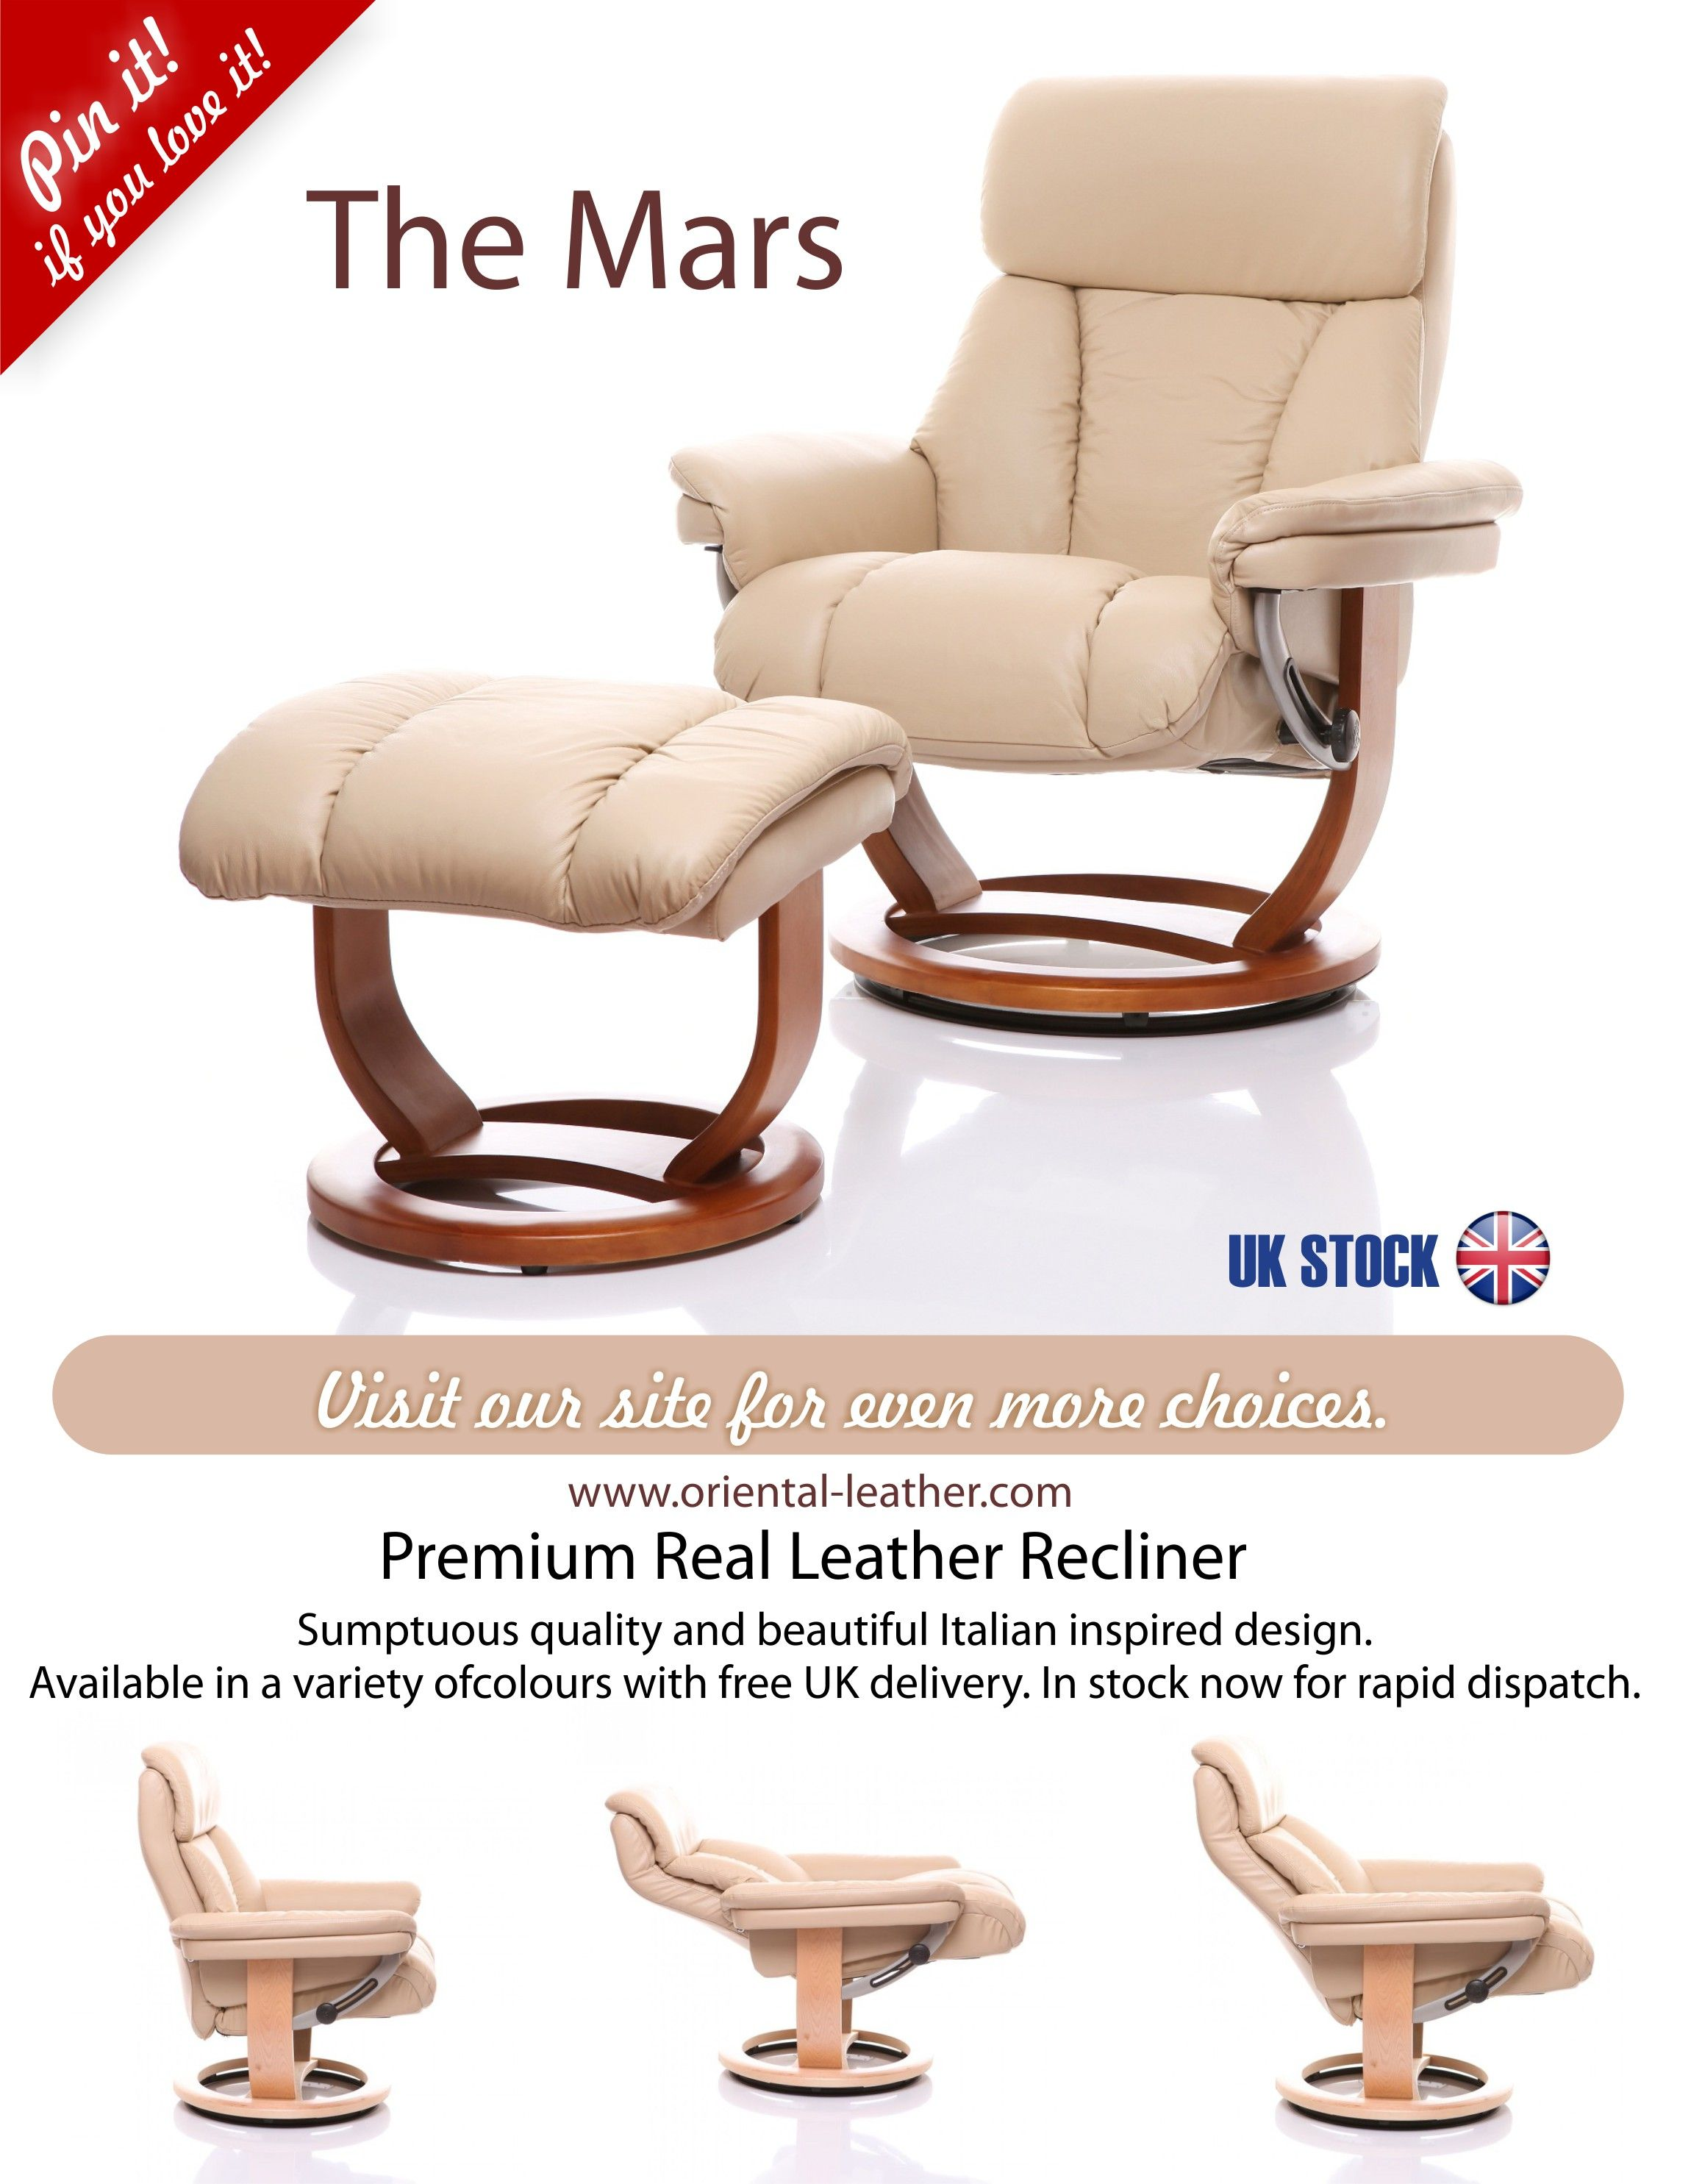 The Mars Italian inspired design premium quality leather